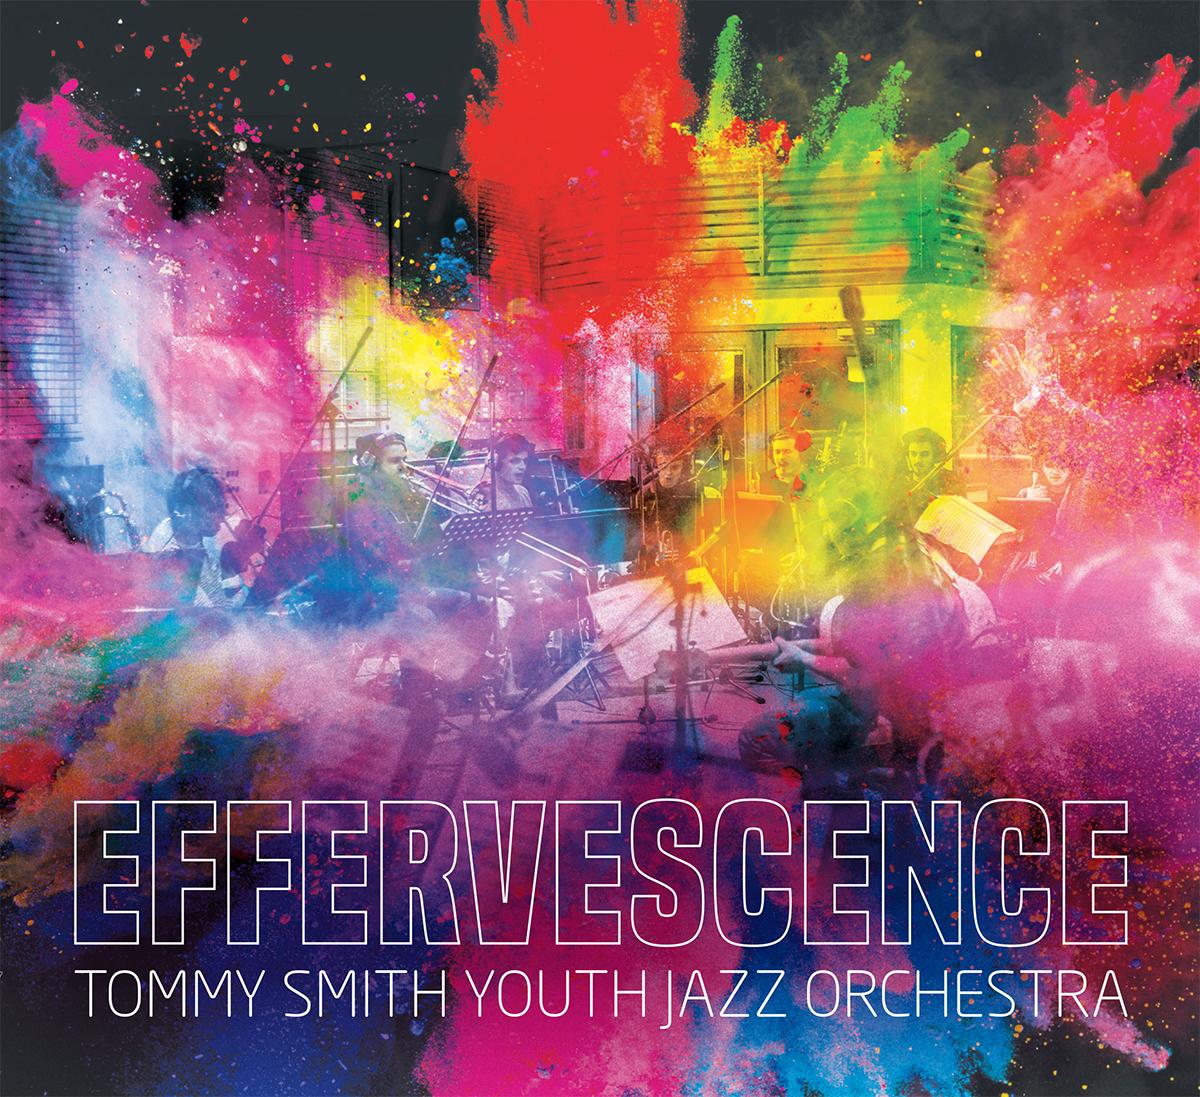 TOMMY SMITH - Tommy Smith Youth Jazz Orchestra : Effervescence cover